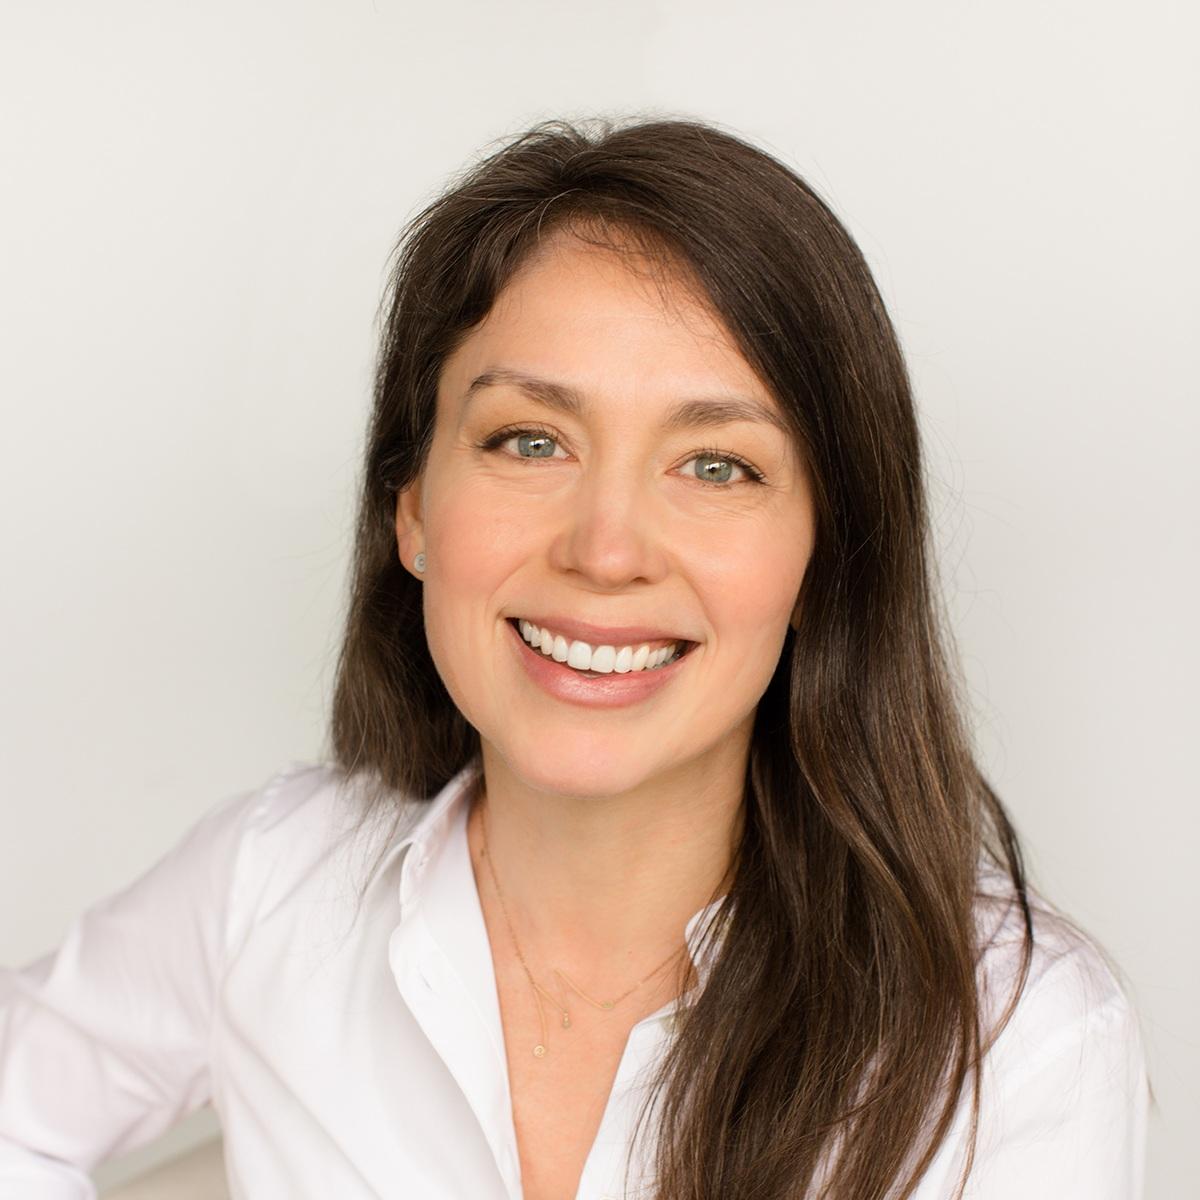 MARY TELLEZ - Financial Wellness Coach & Registered Investment Advisor